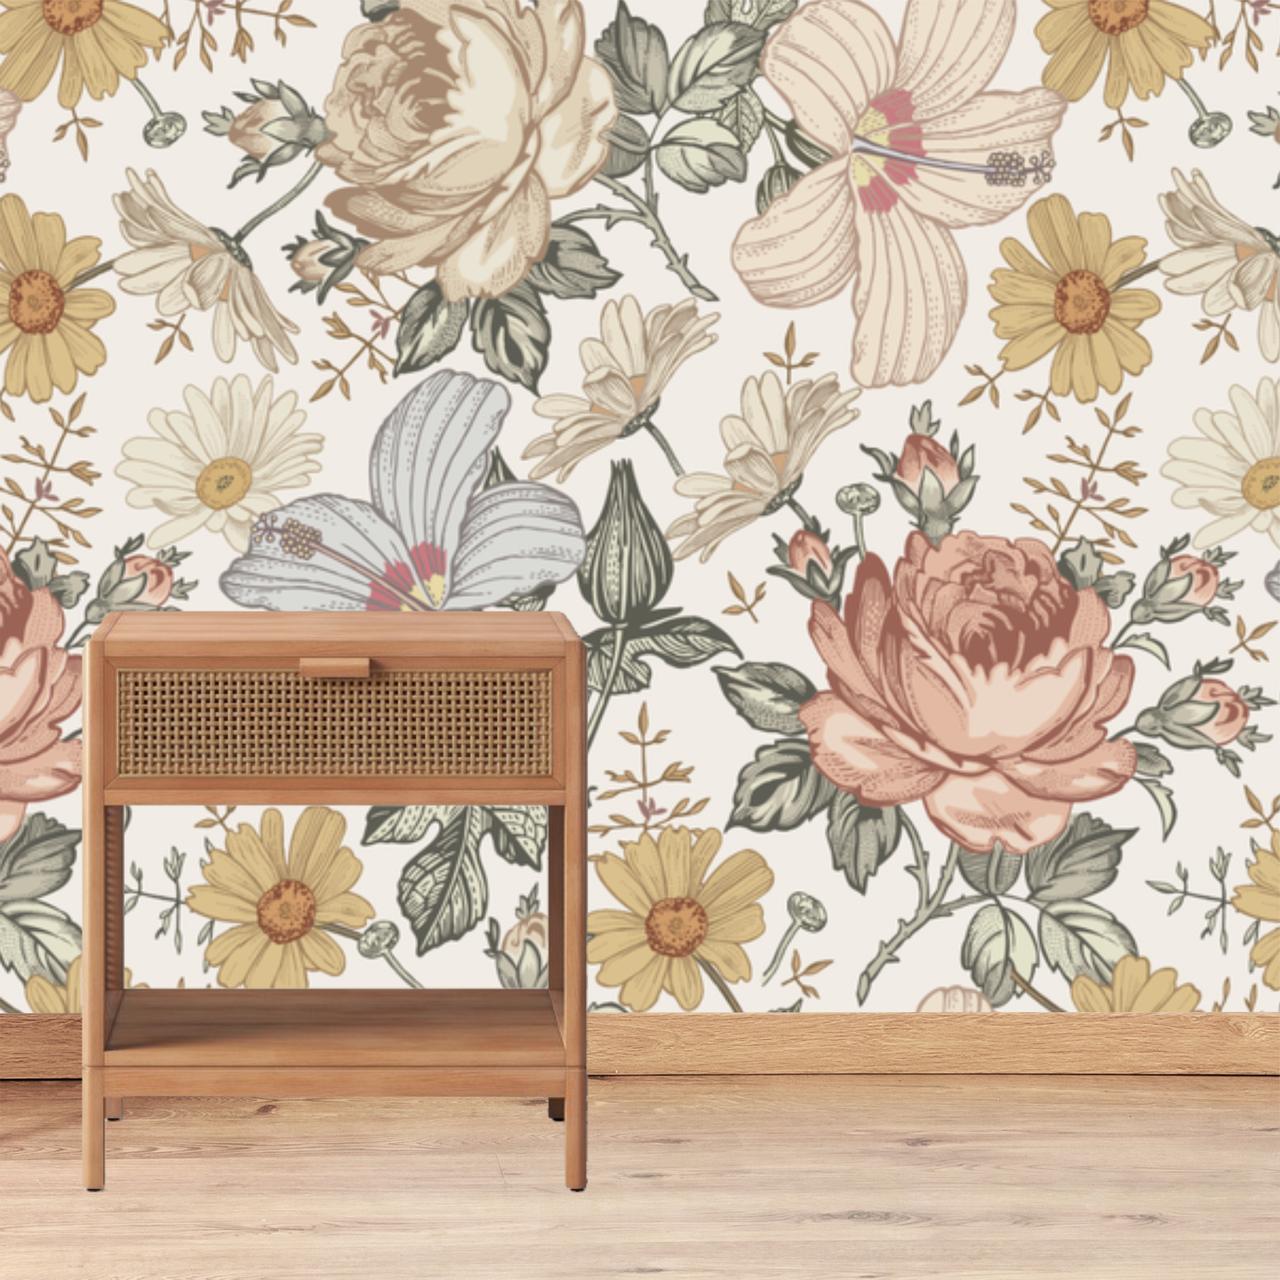 Vintage Floral Crib Sheet - HD Wallpaper